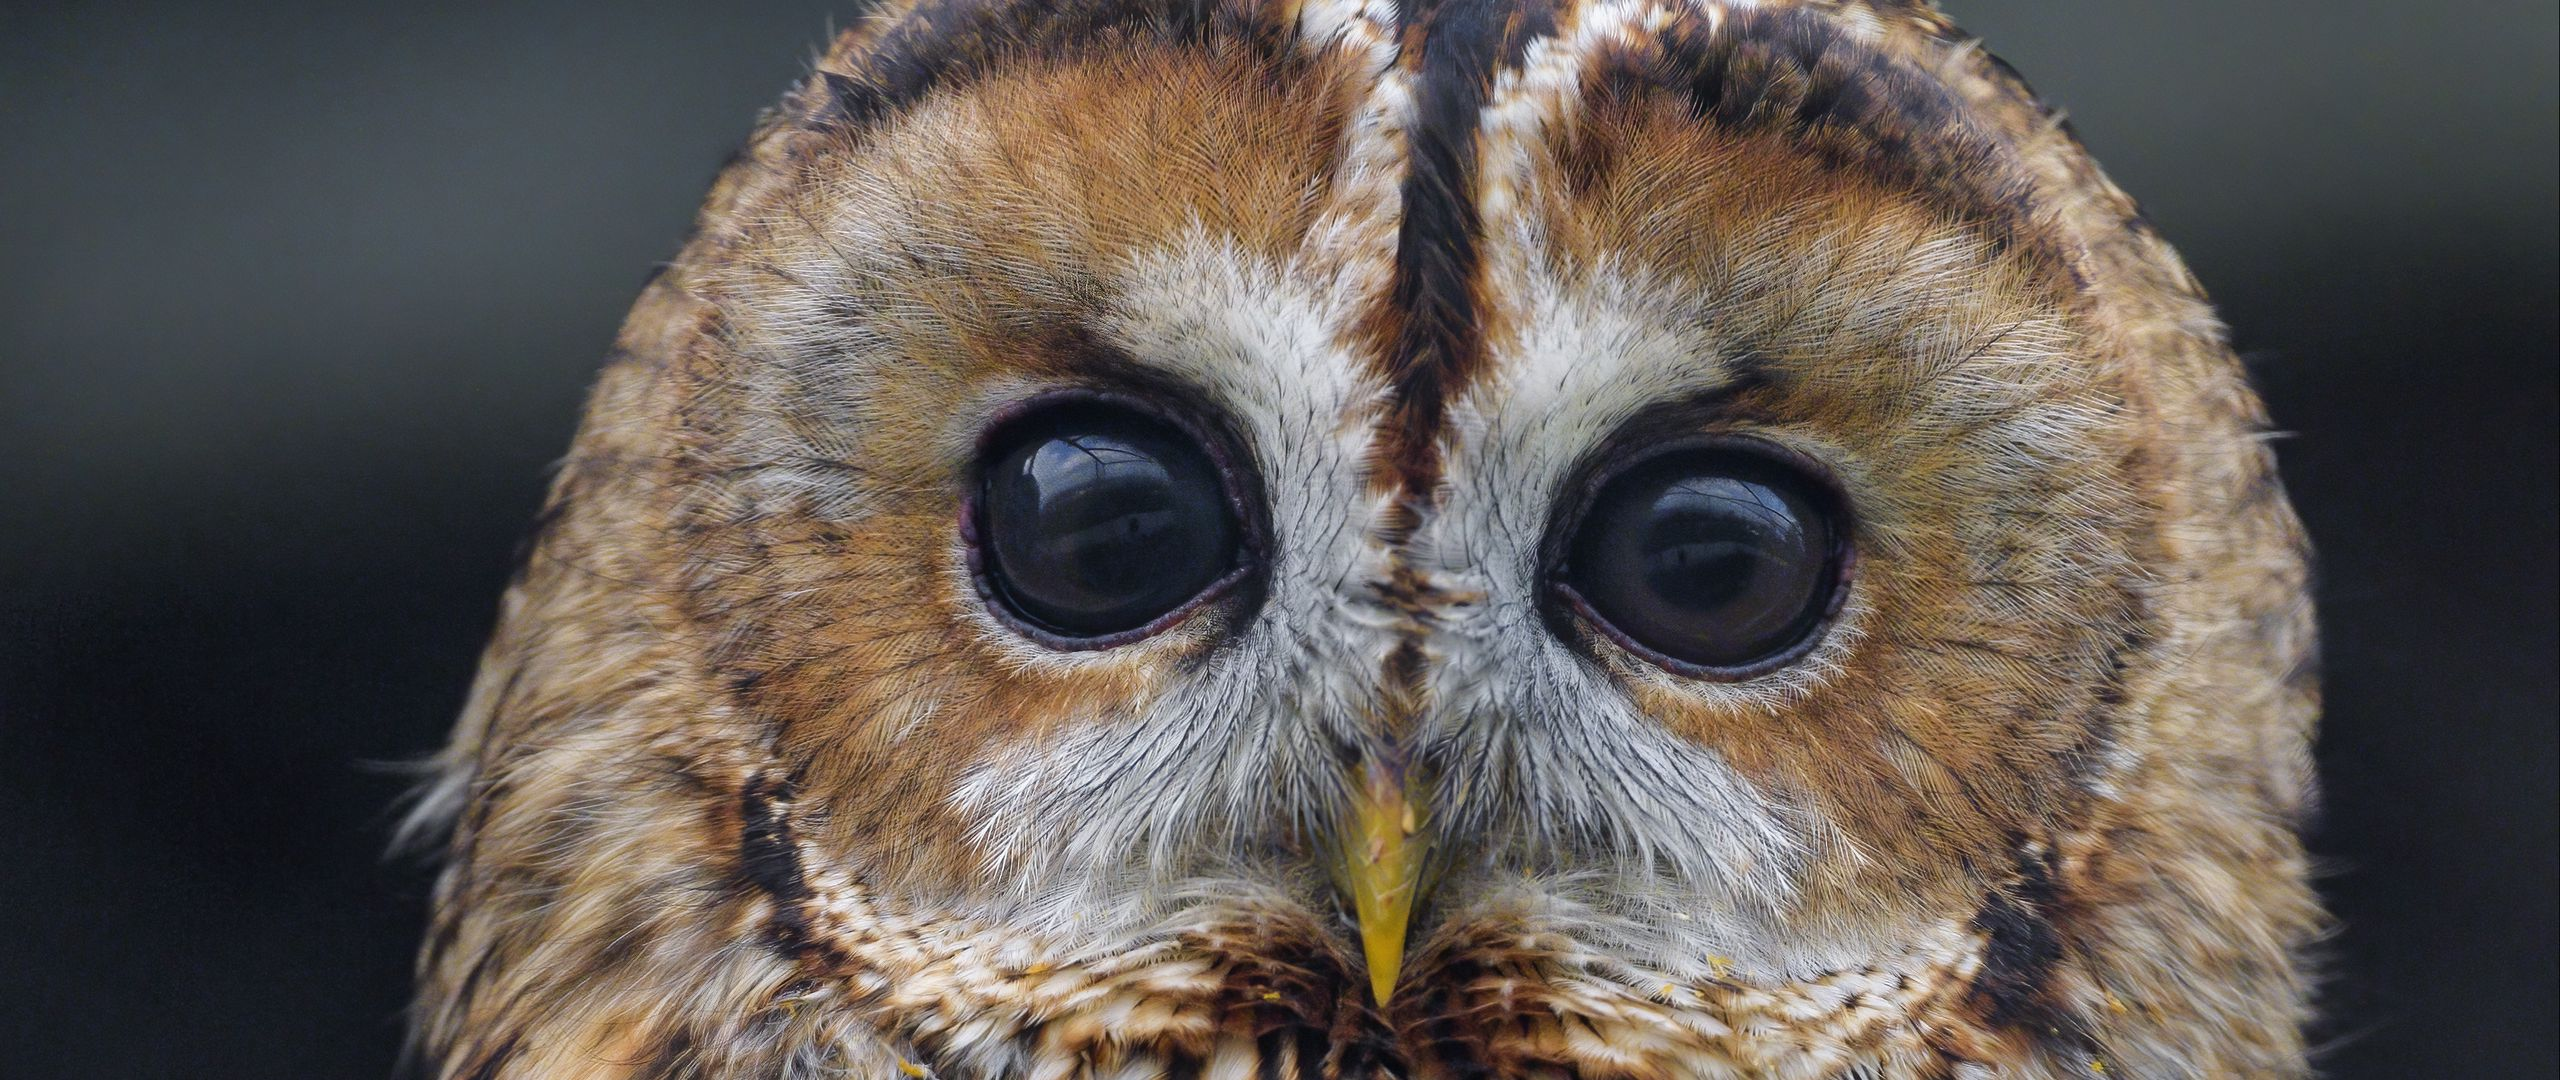 Wallpaper Owl watching